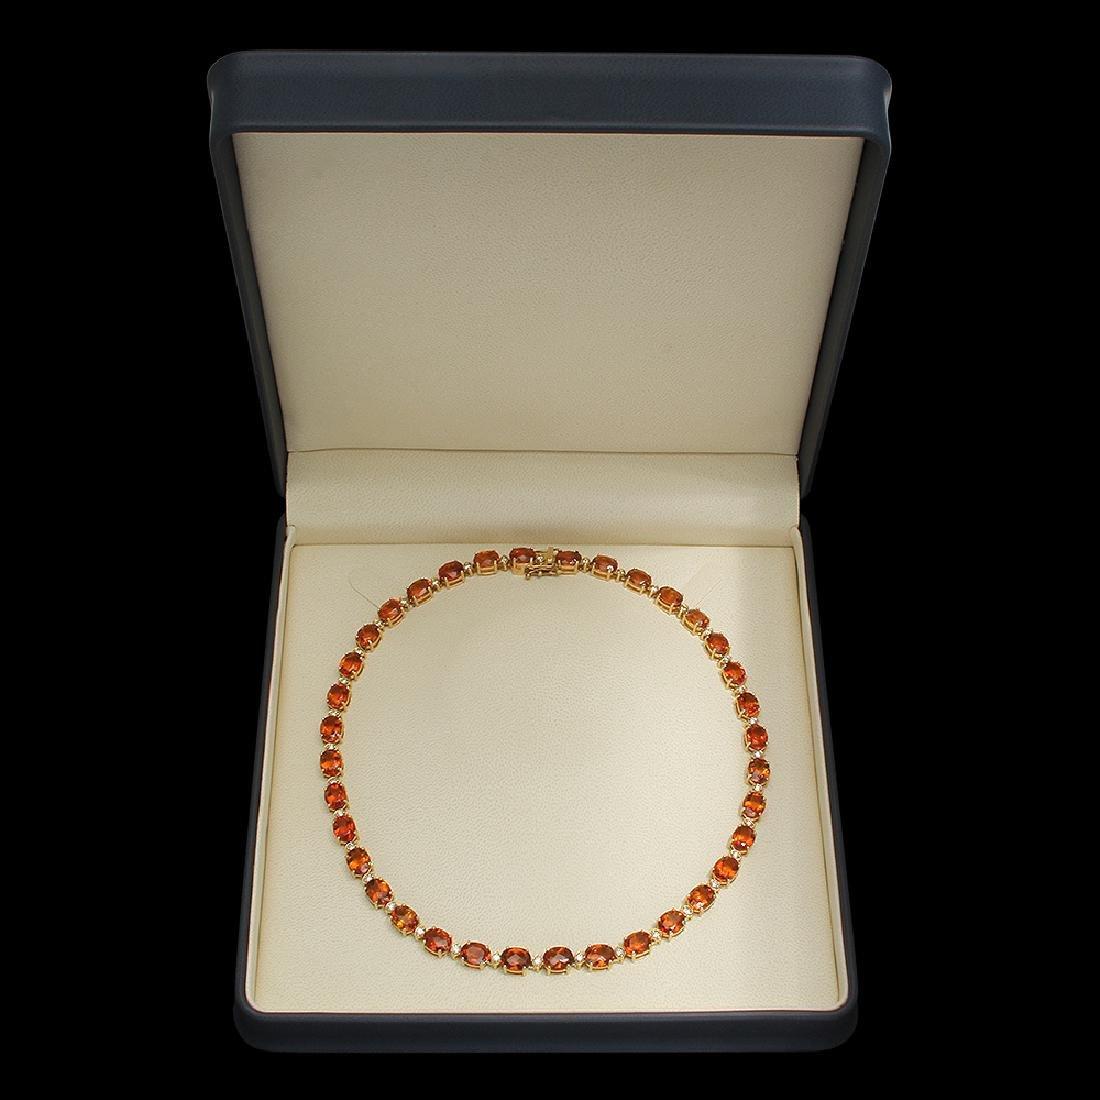 14K Gold 60.15ct Citrine Diamond Necklace - 4